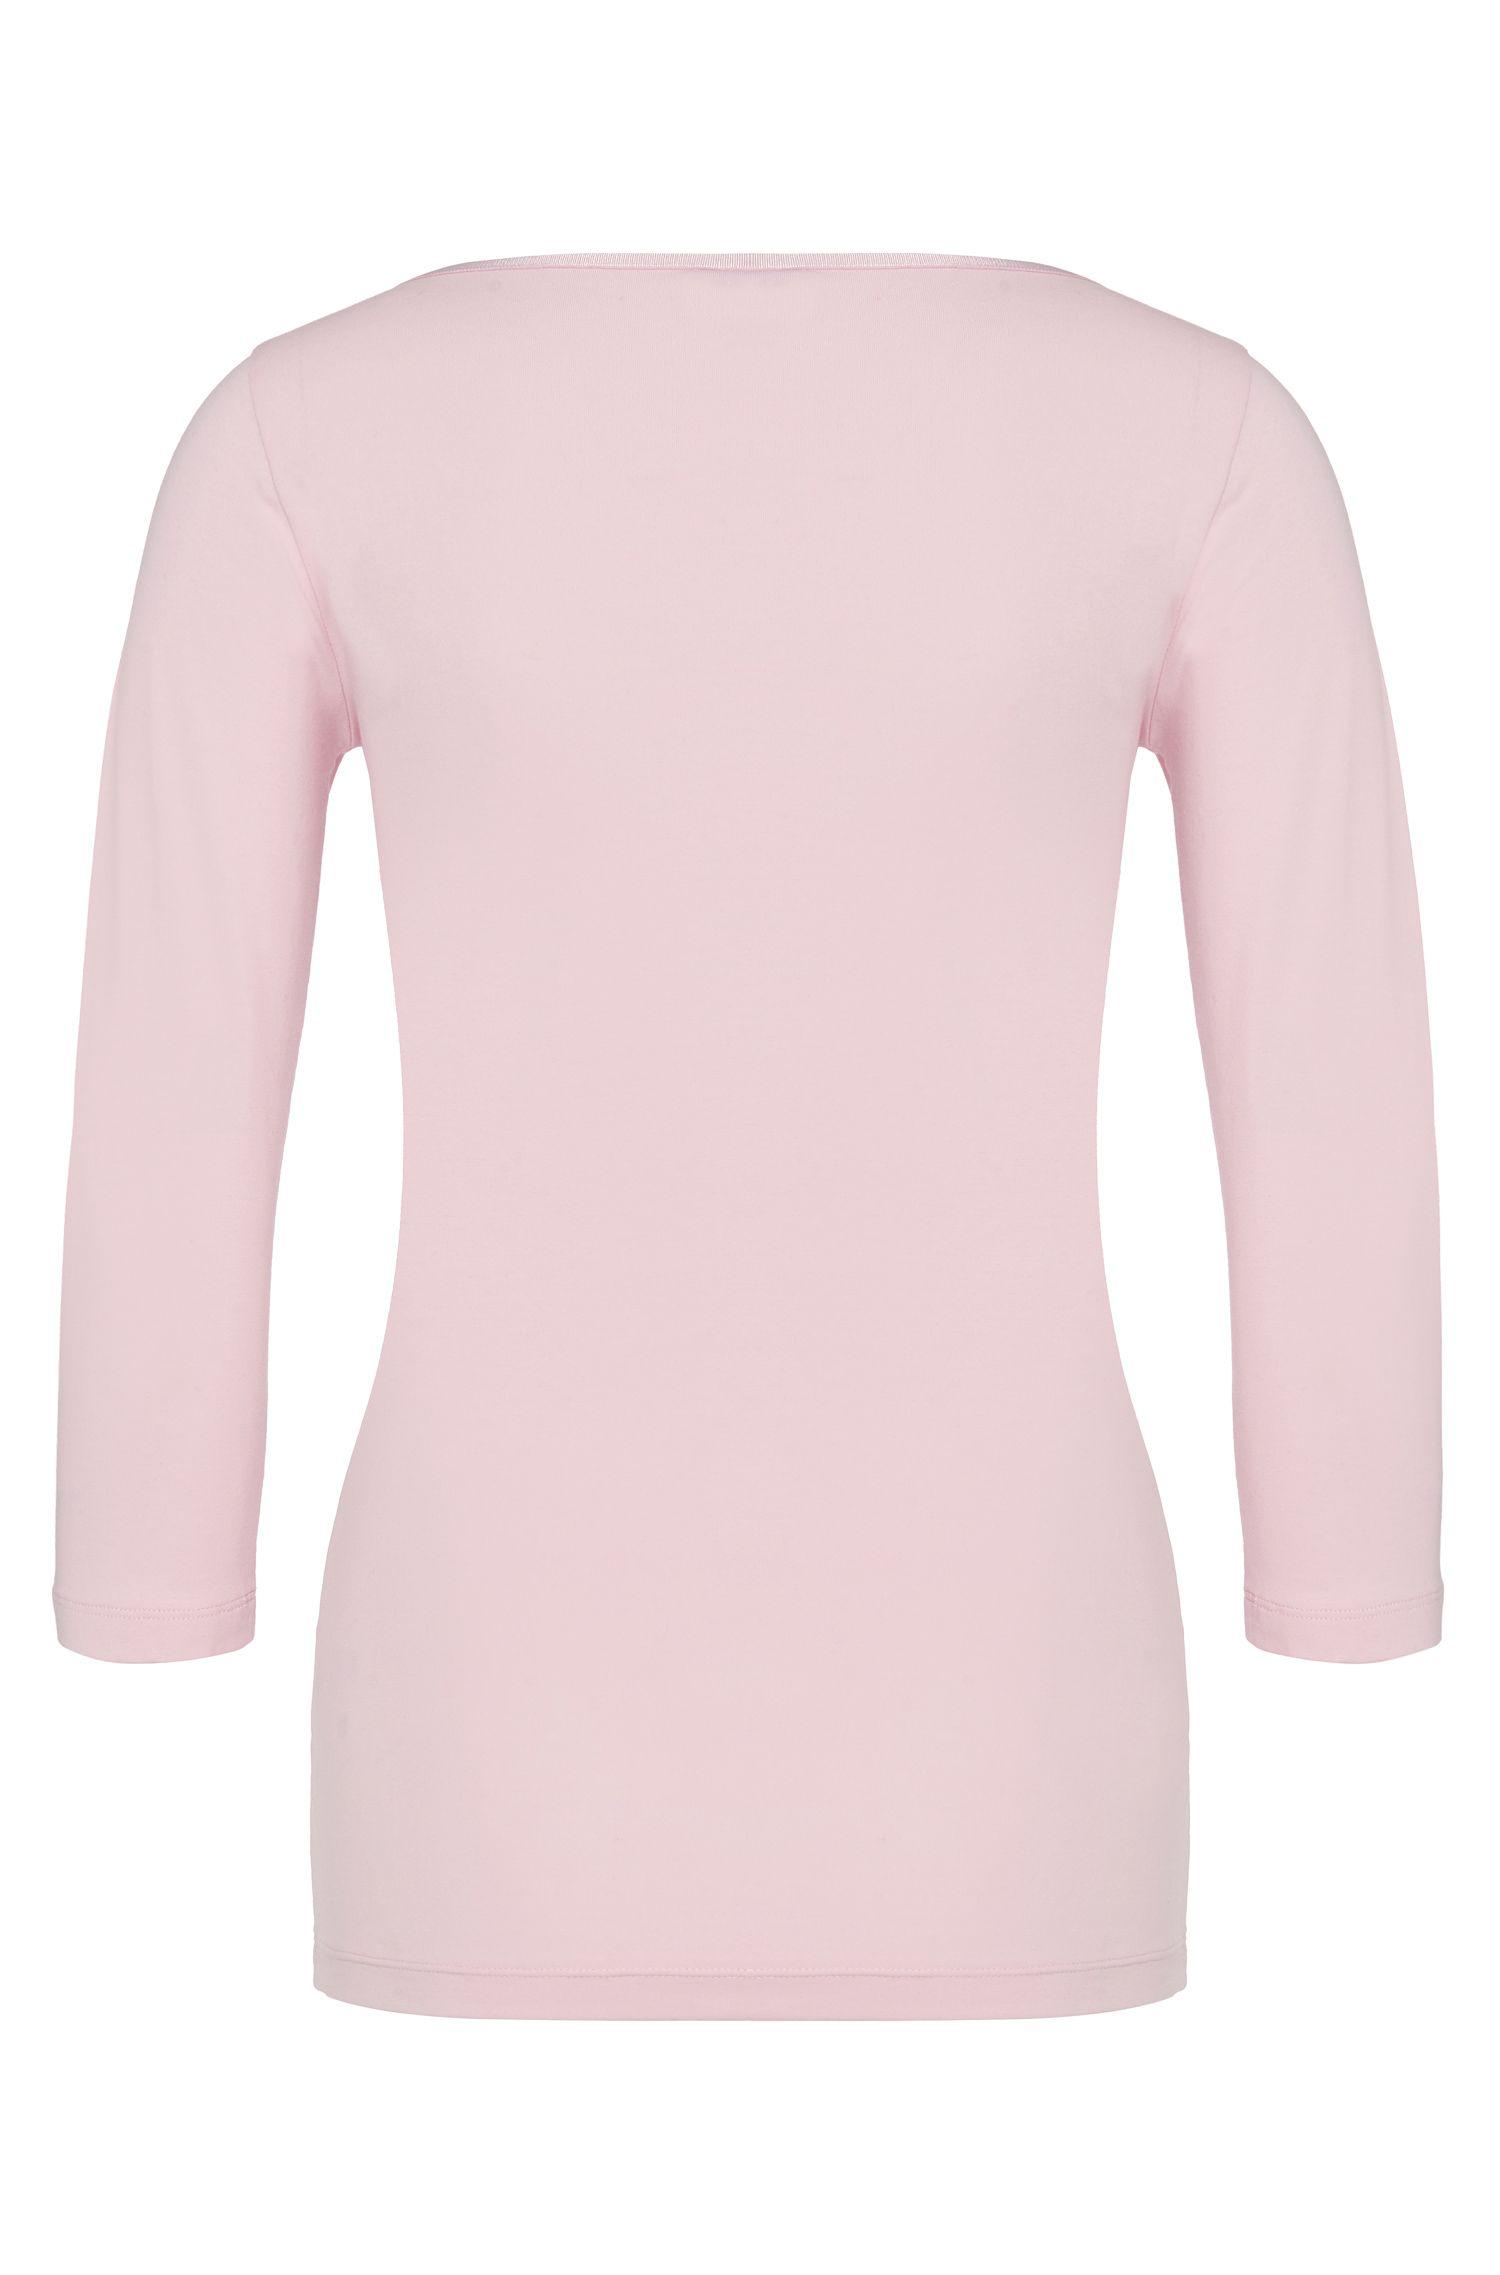 T-shirt uni en coton stretch: «Dannala»